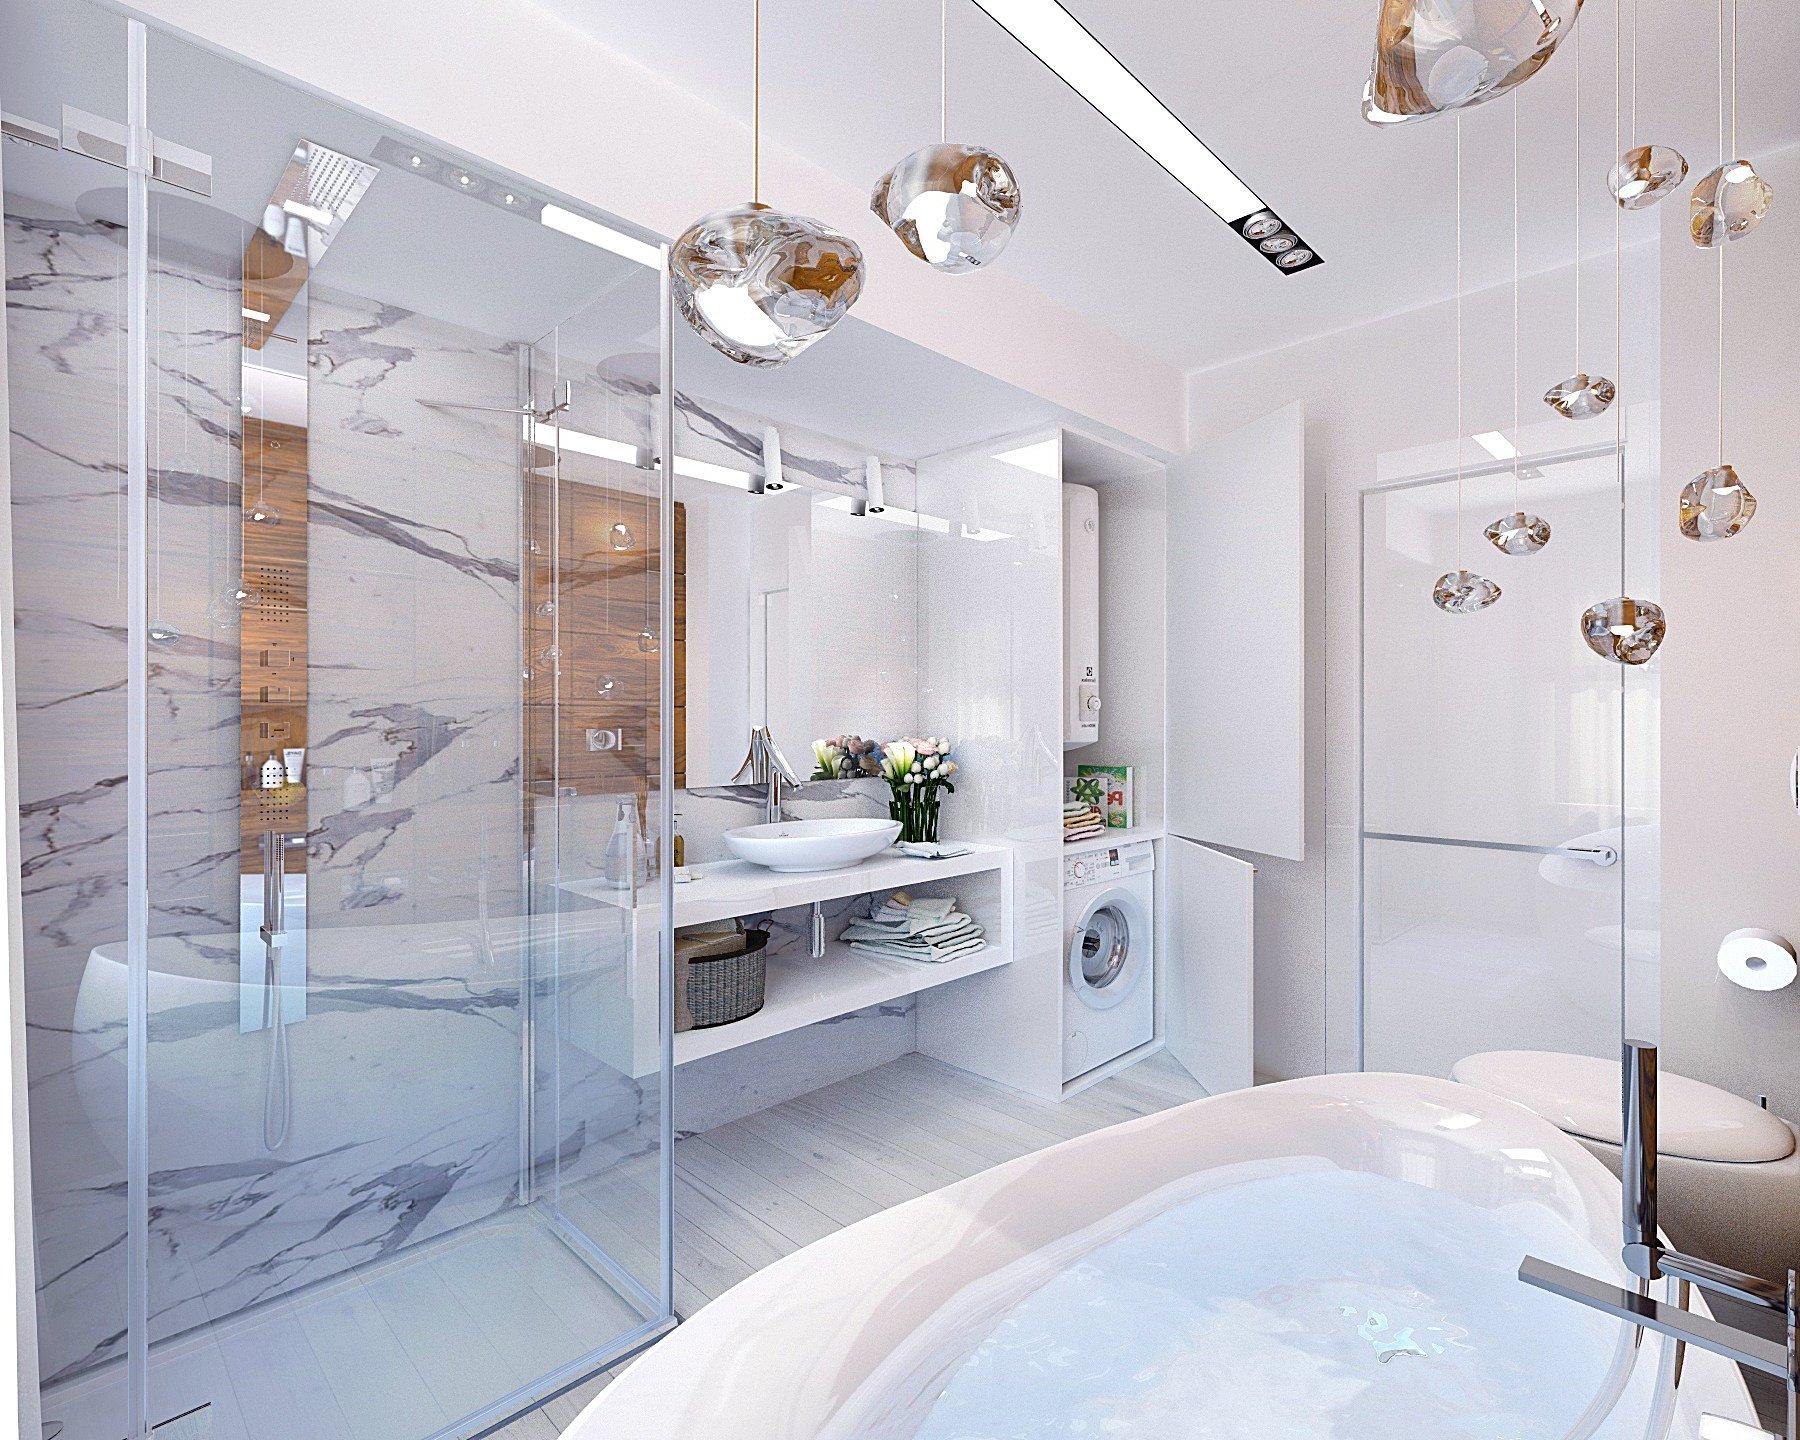 Дизайн ванной комнаты 8 кв м